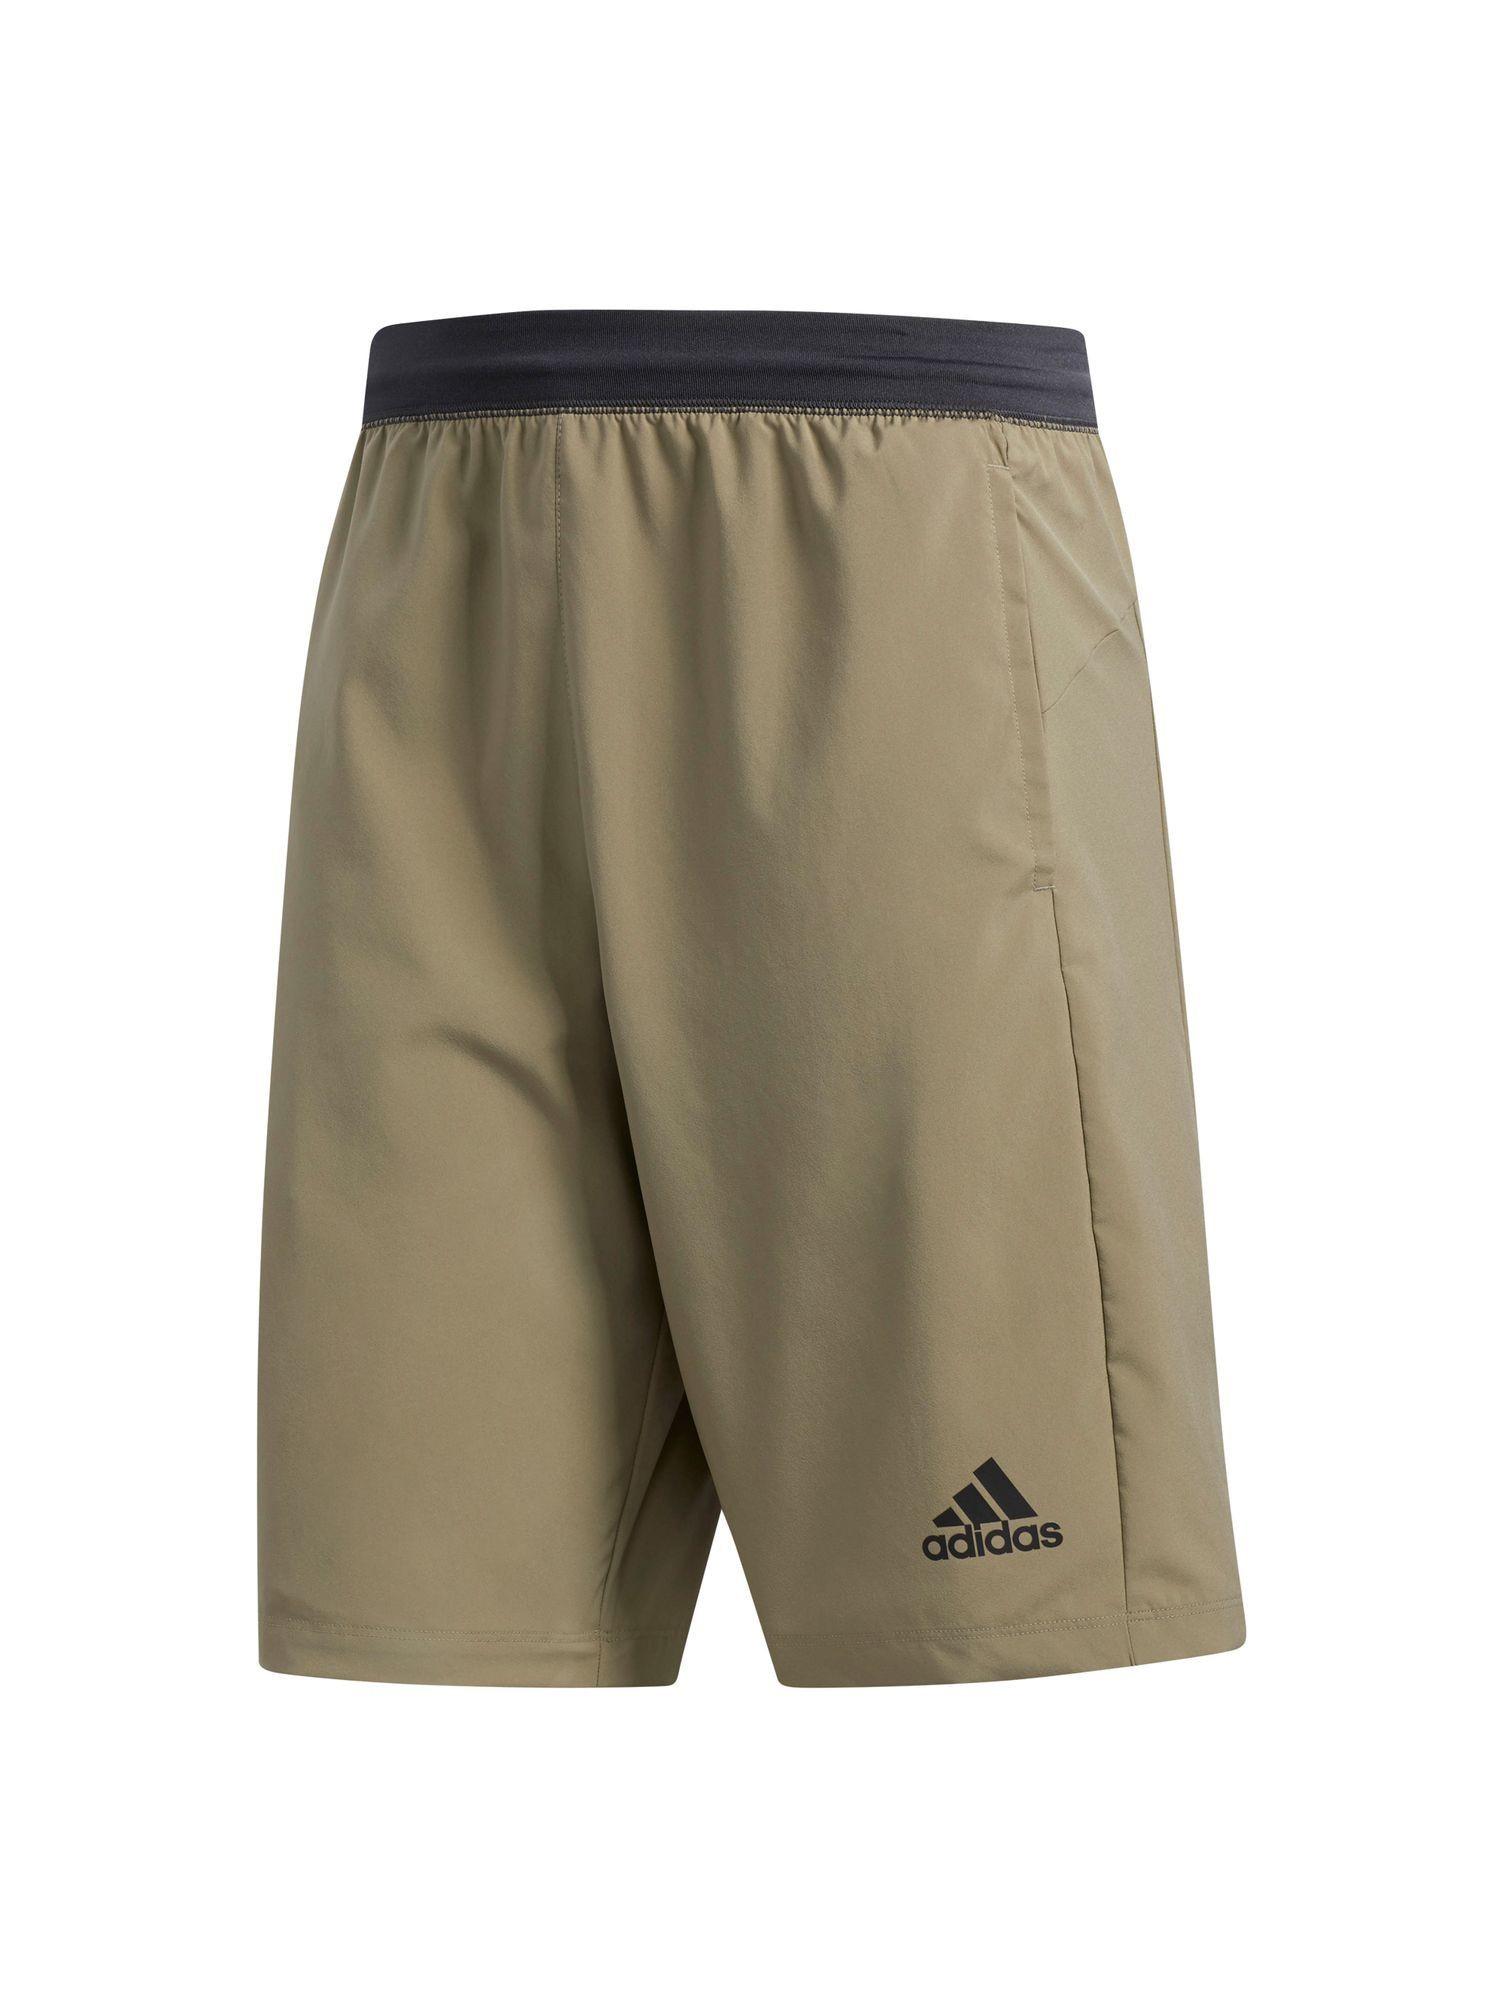 Adidas DESIGN 2 MOVE SHORTS